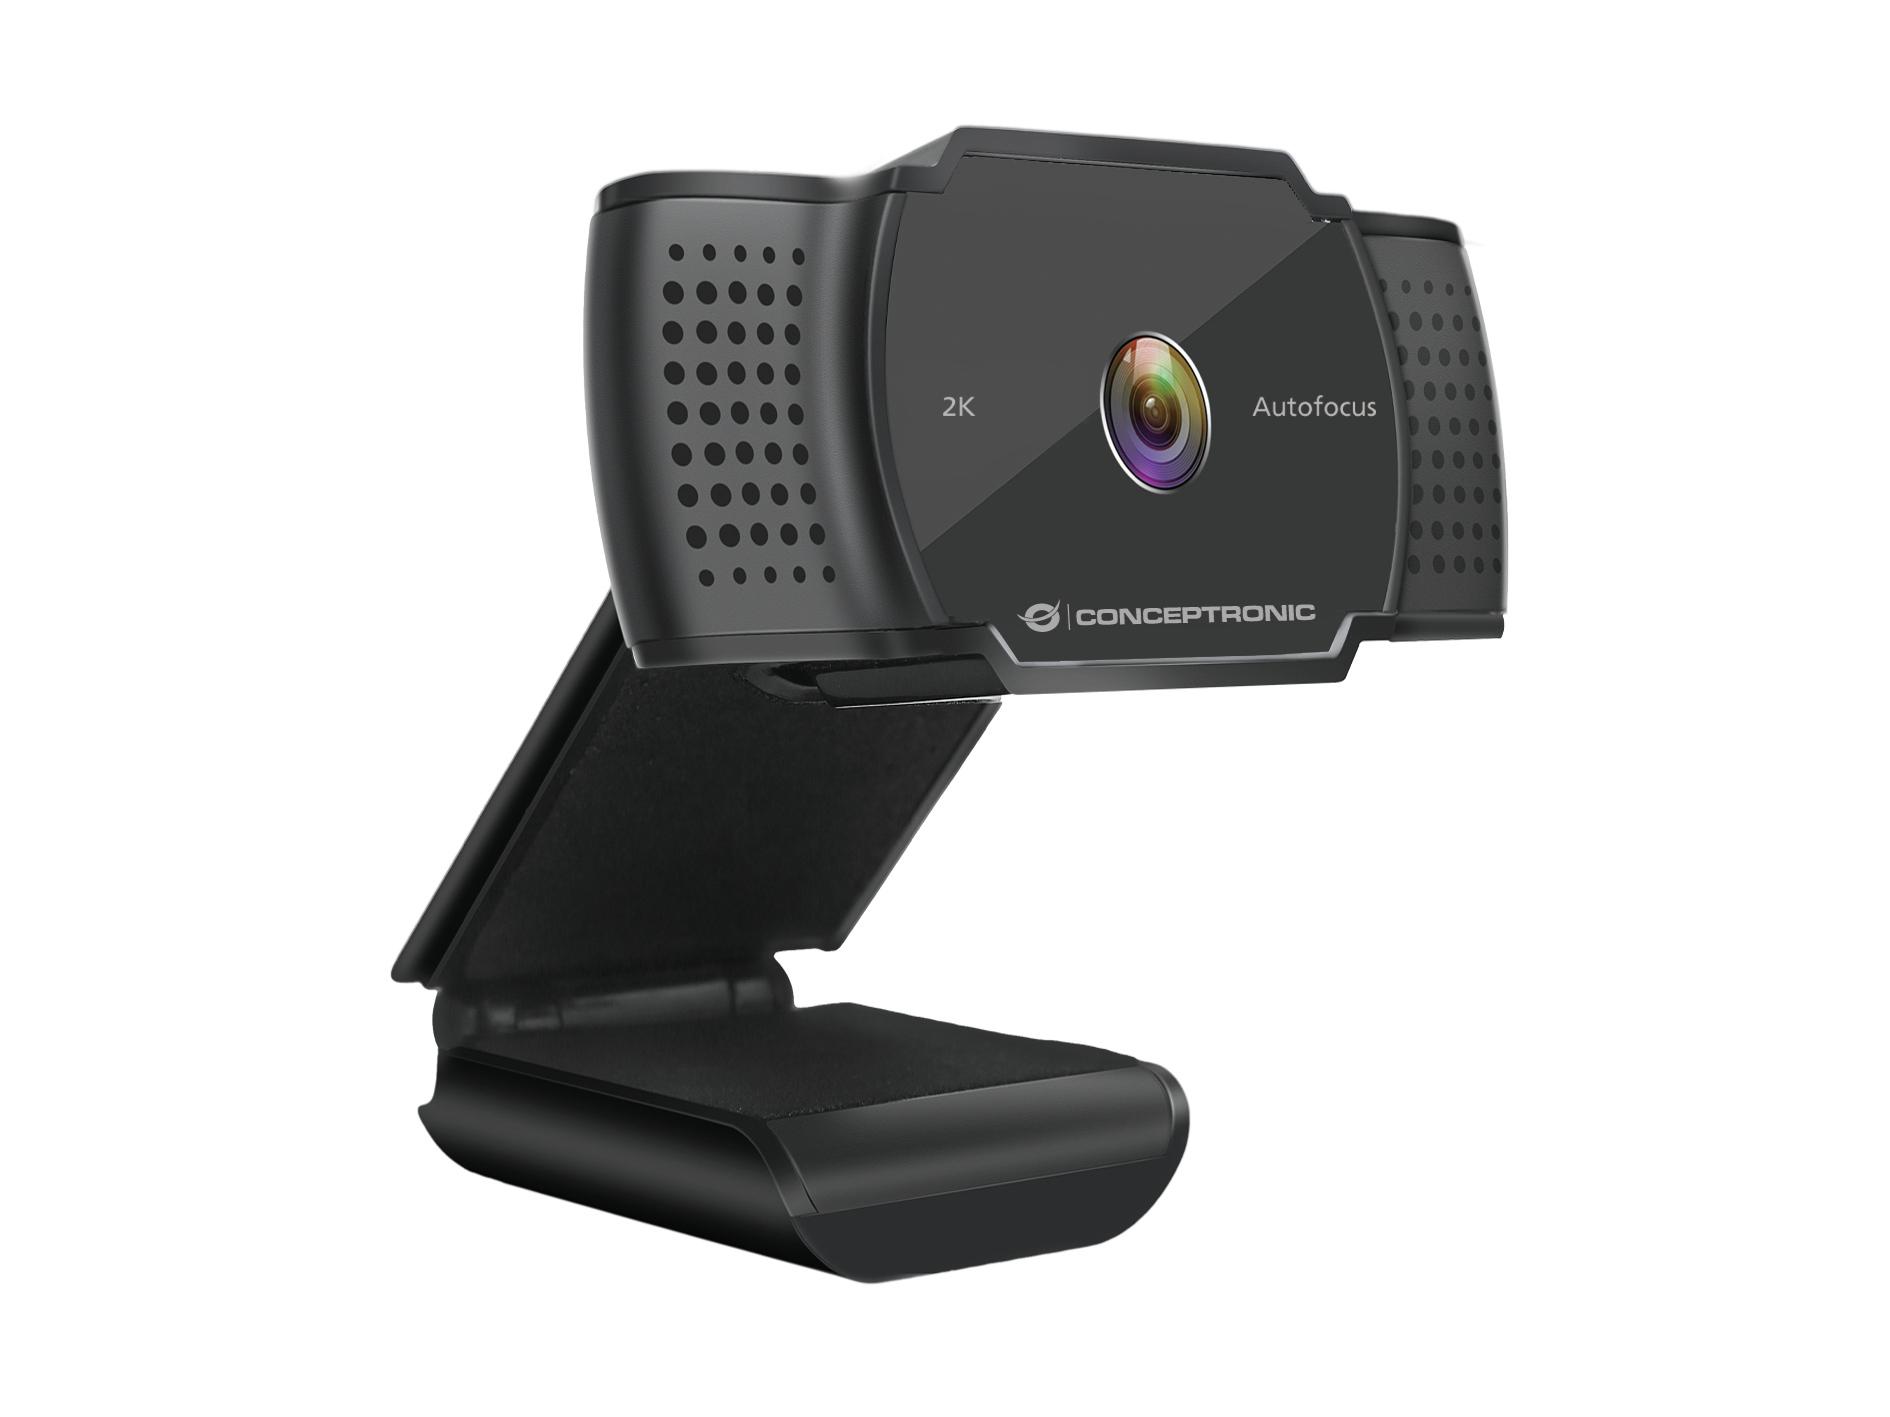 Conceptronic AMDIS 2K Super HD Autofocus Webcam with Microphone